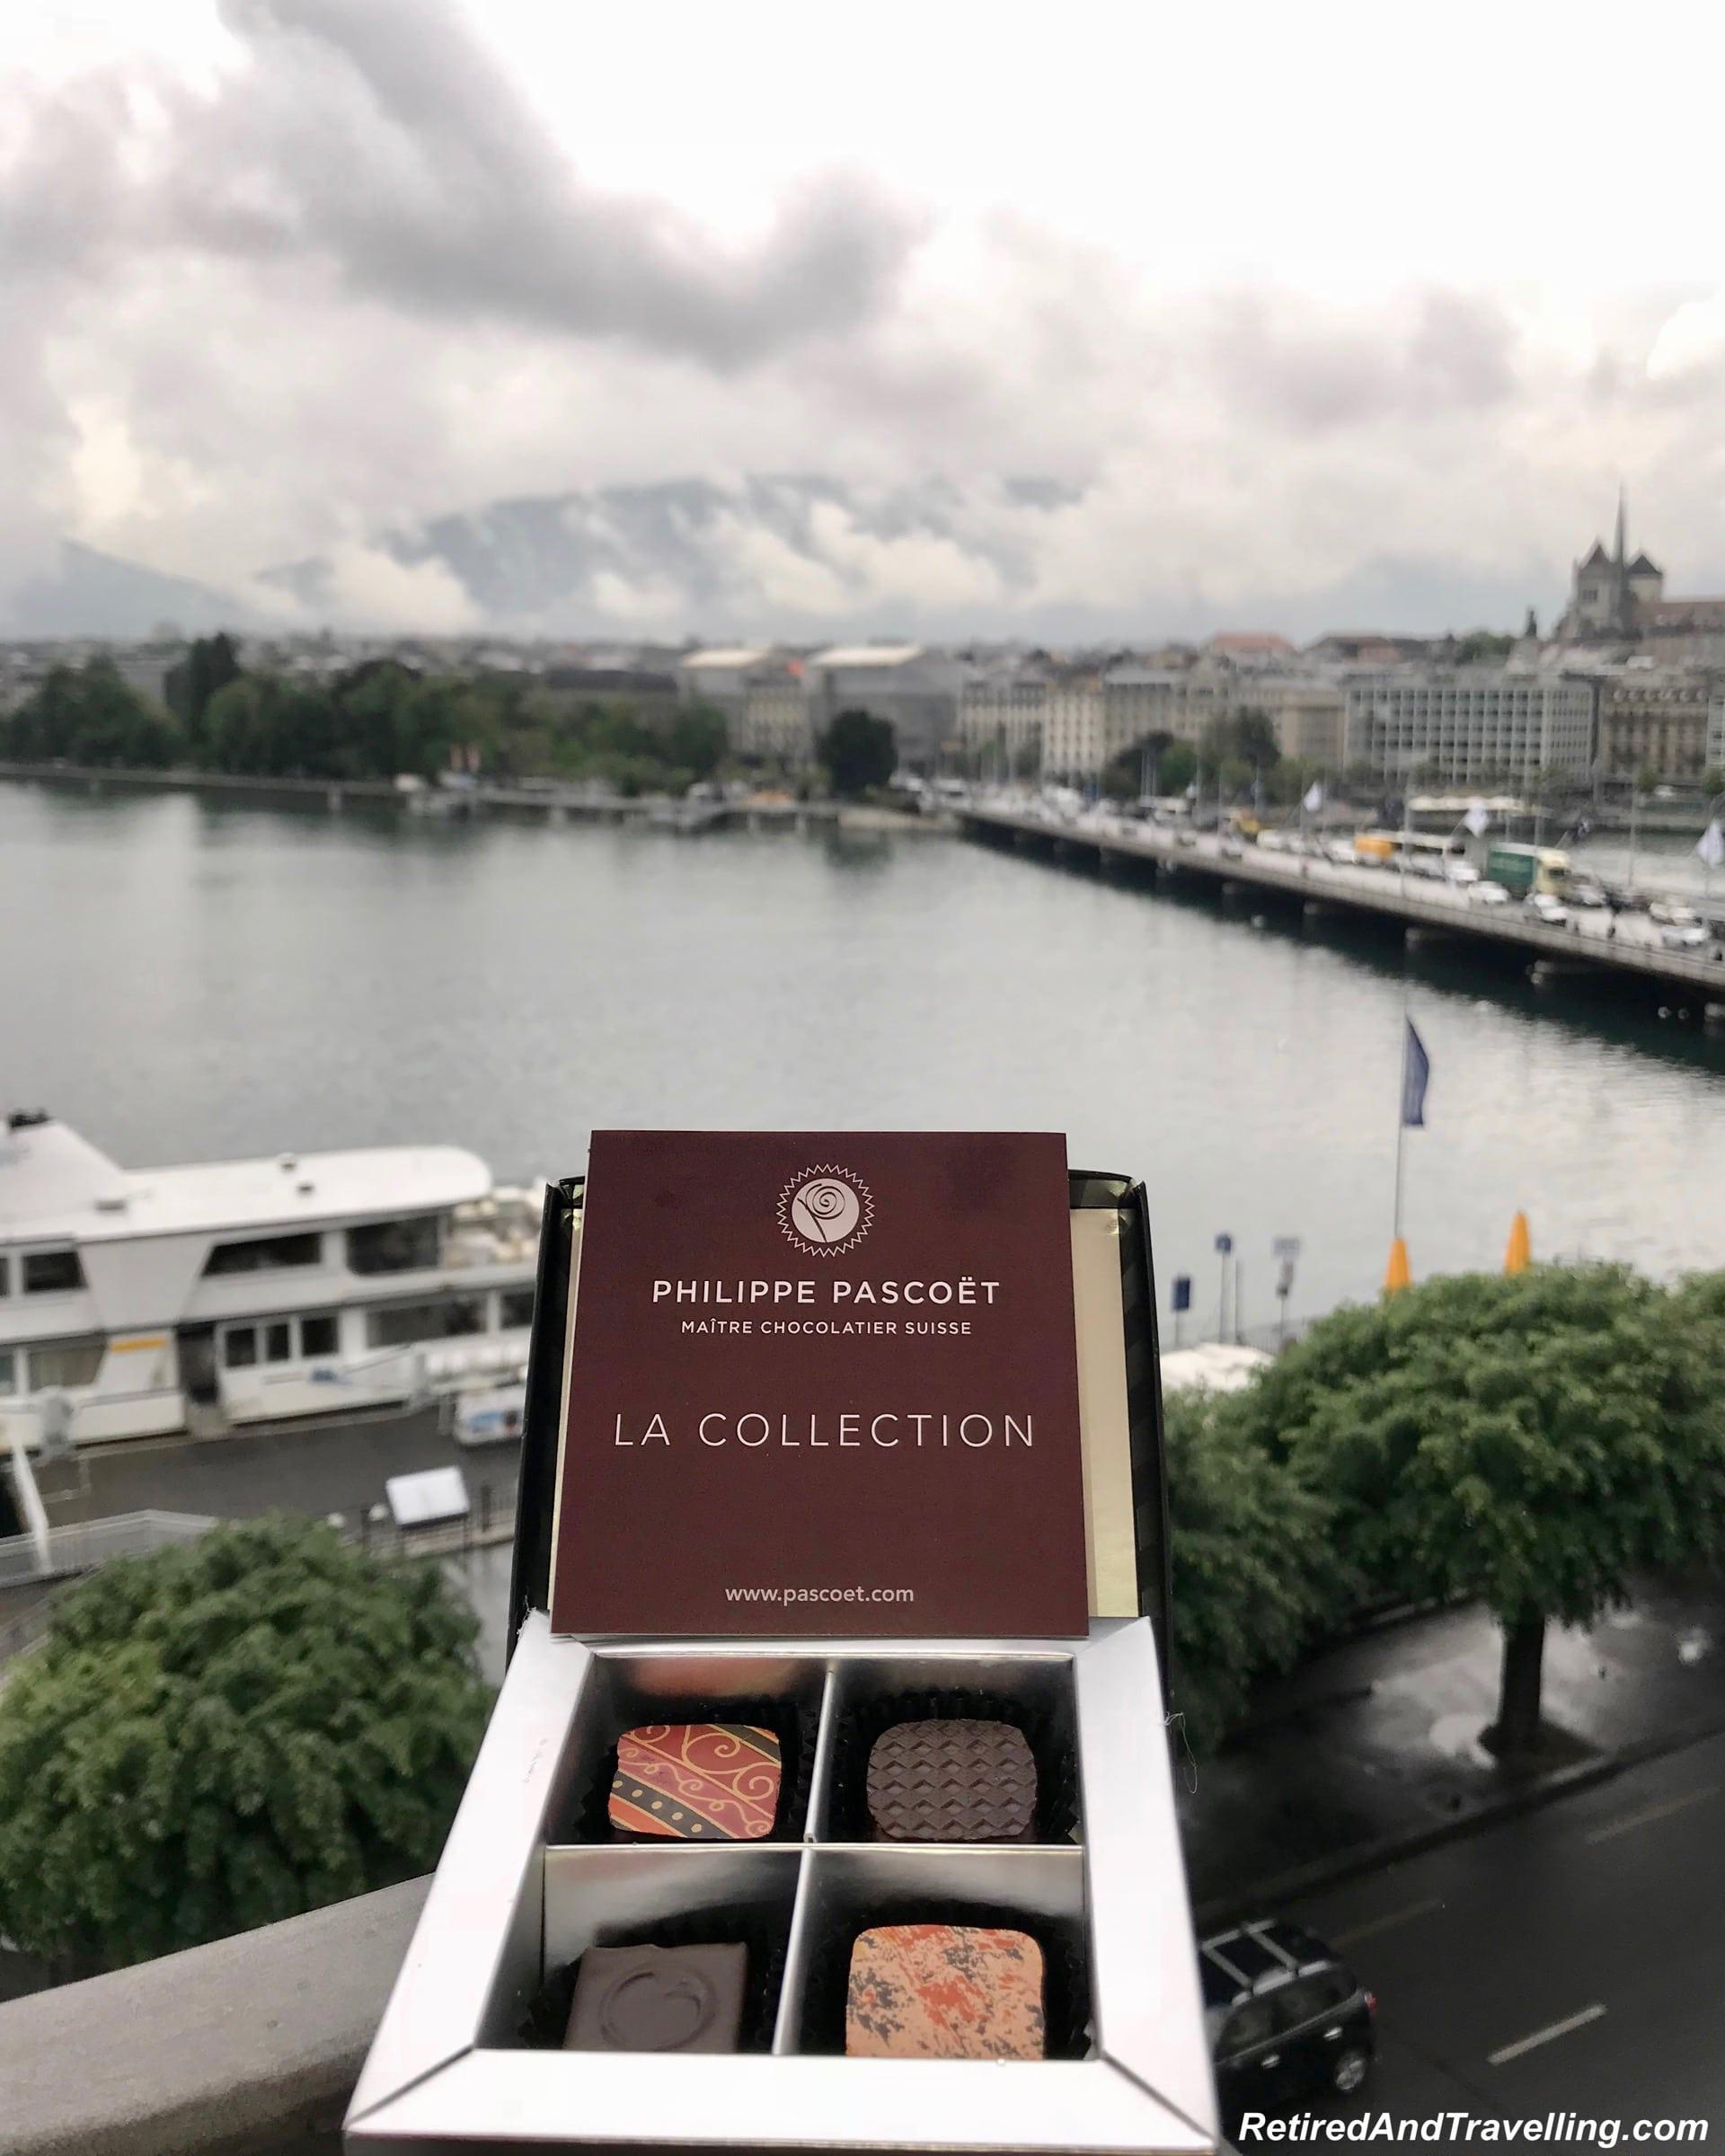 GenevaFoodRitzChocolate2-2018-05-24-10-39.jpg